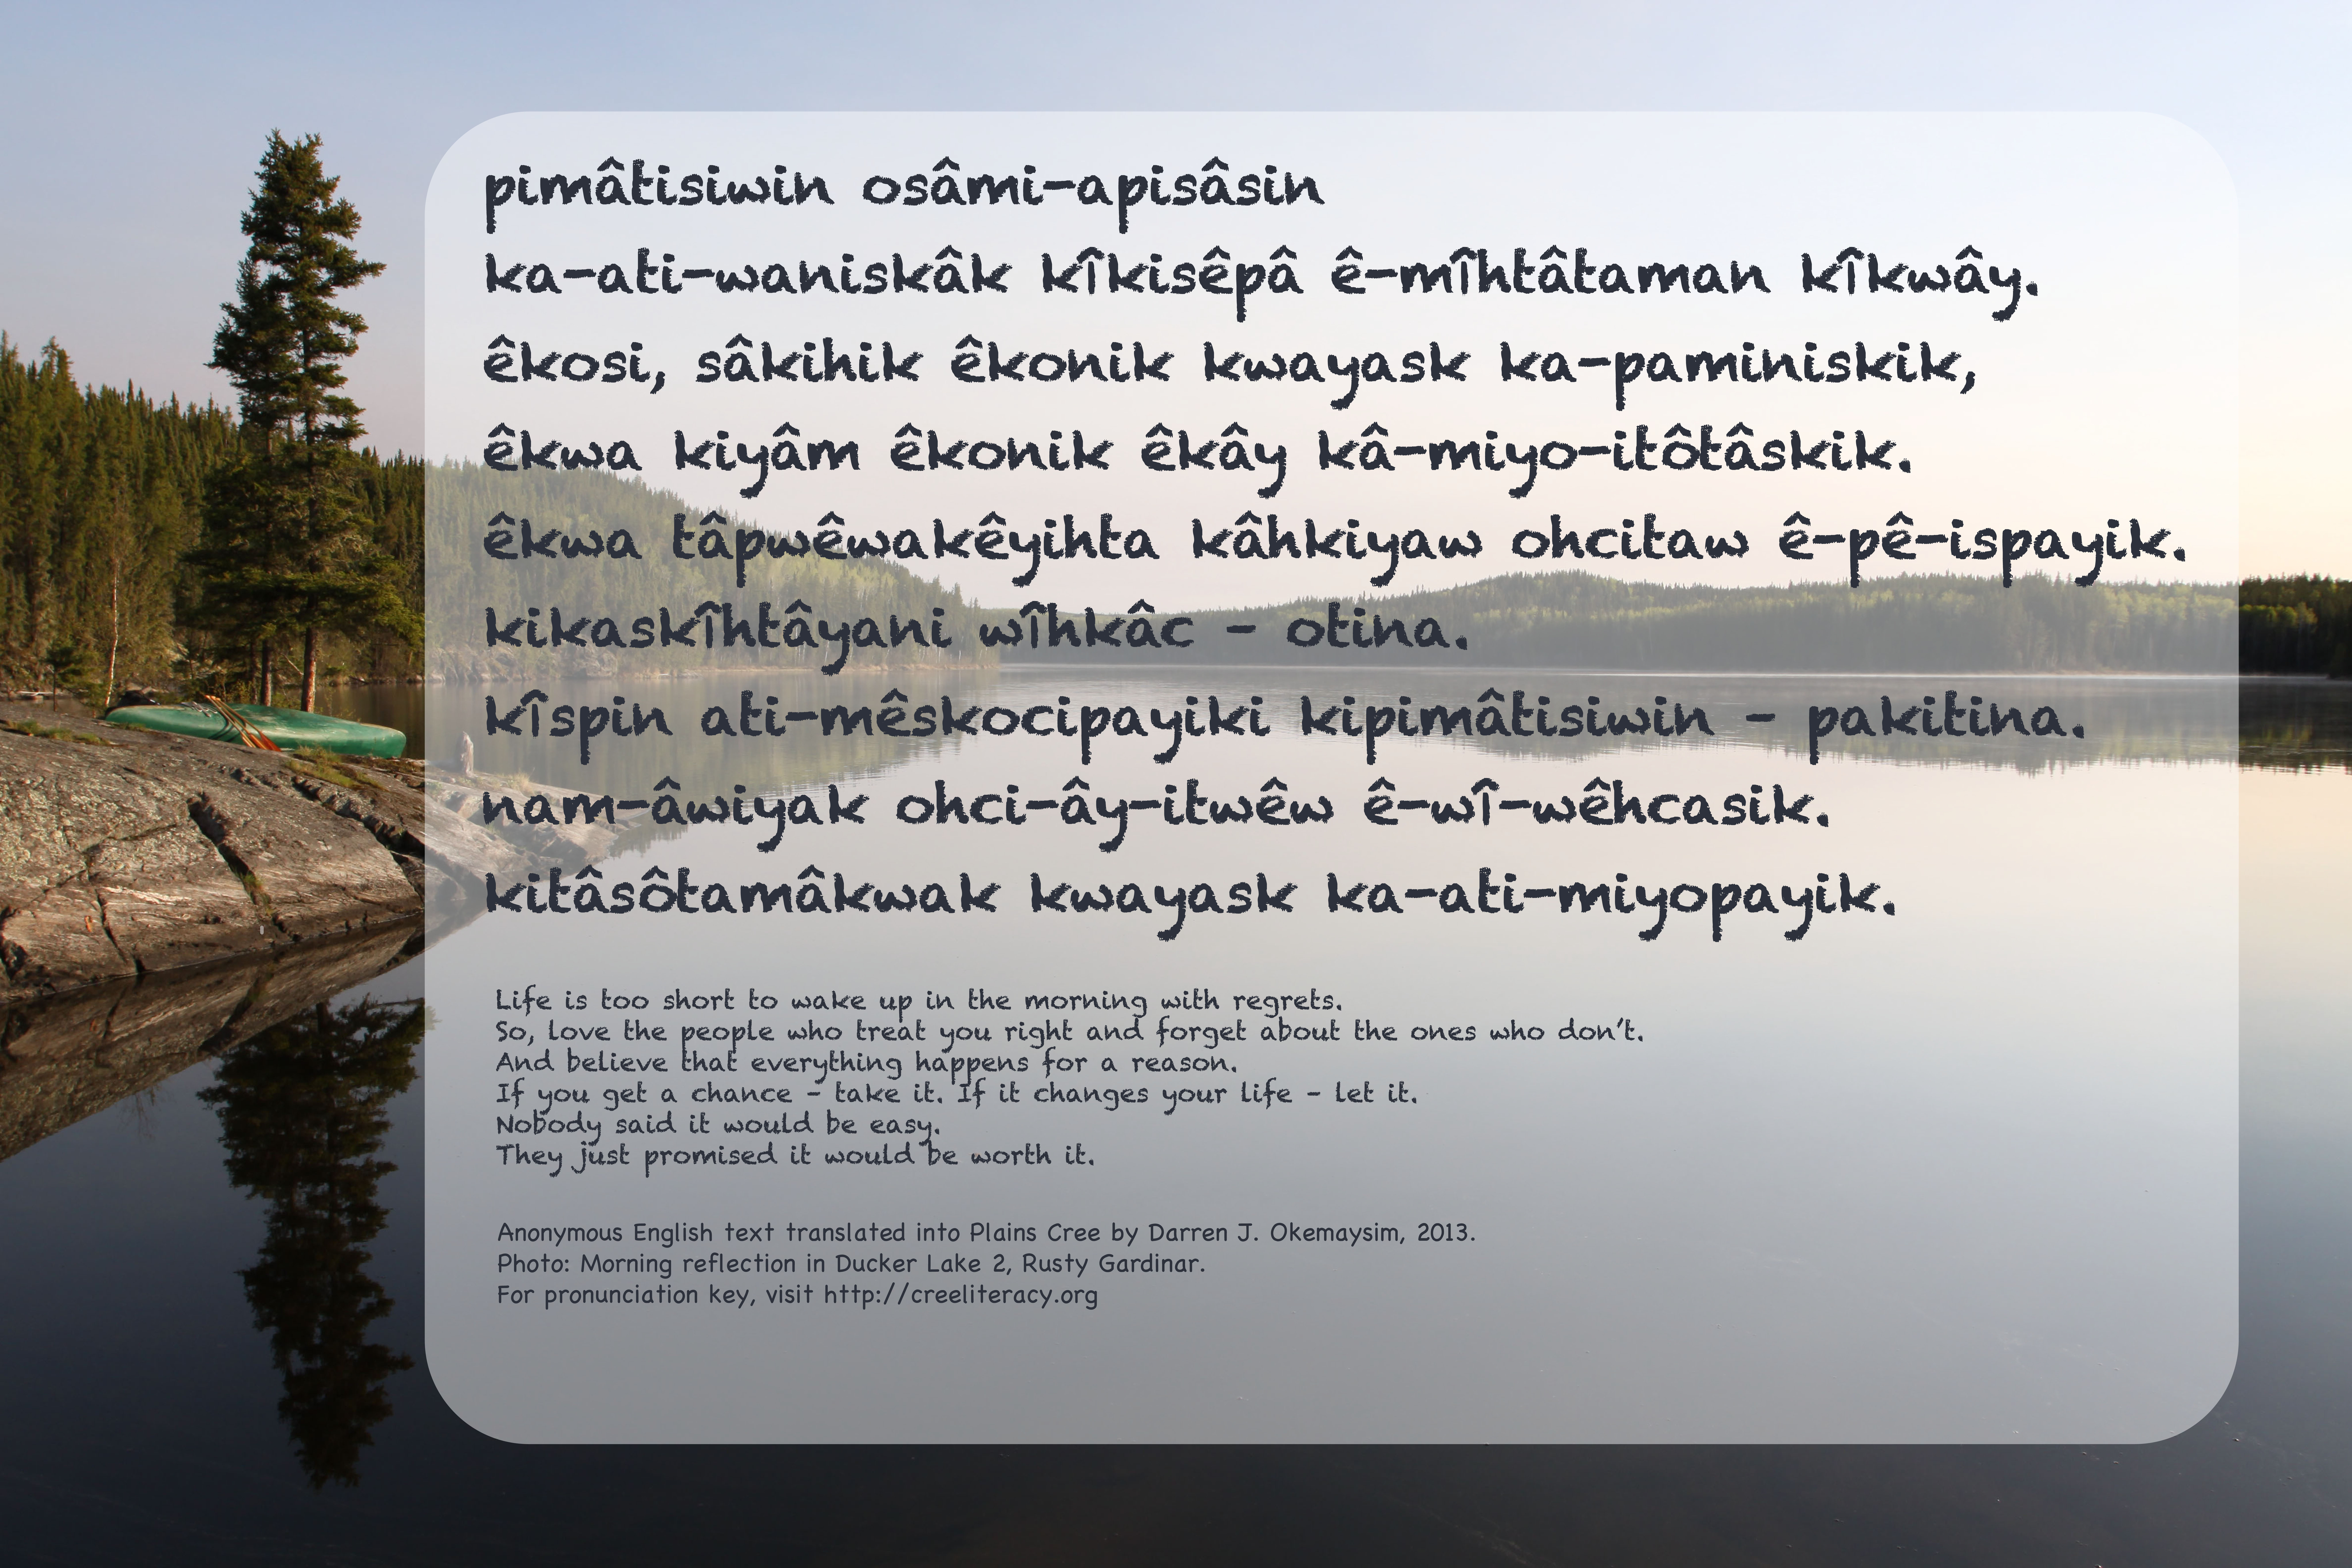 pimatisiwin